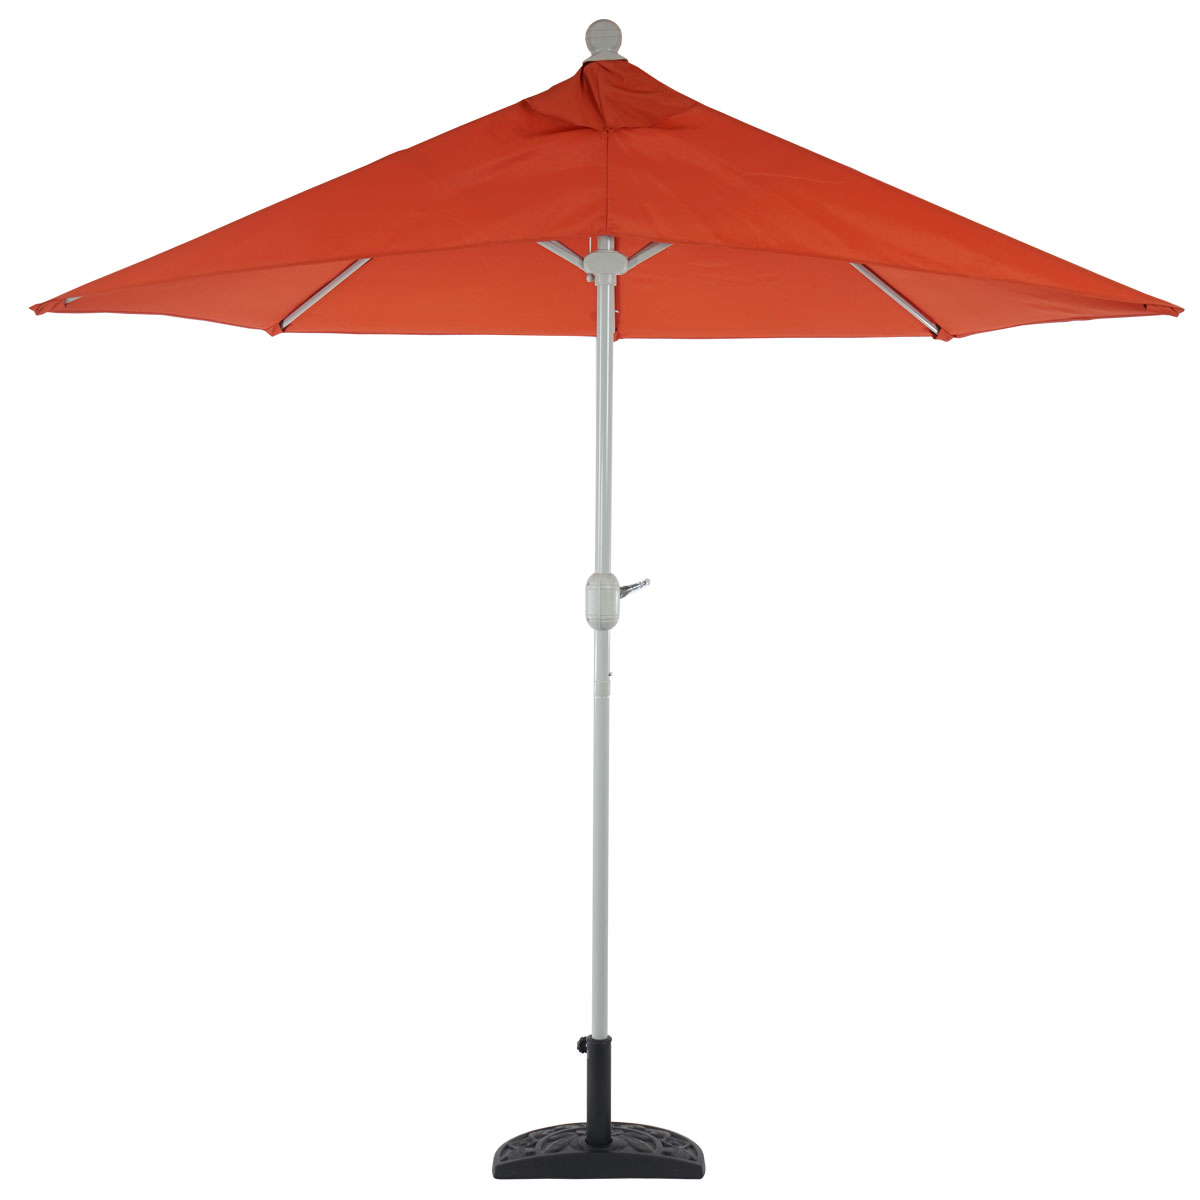 Demi parasol aluminium parla pour balcon ip 50 285cm terracotta avec pied ebay - Demi parasol balcon ...